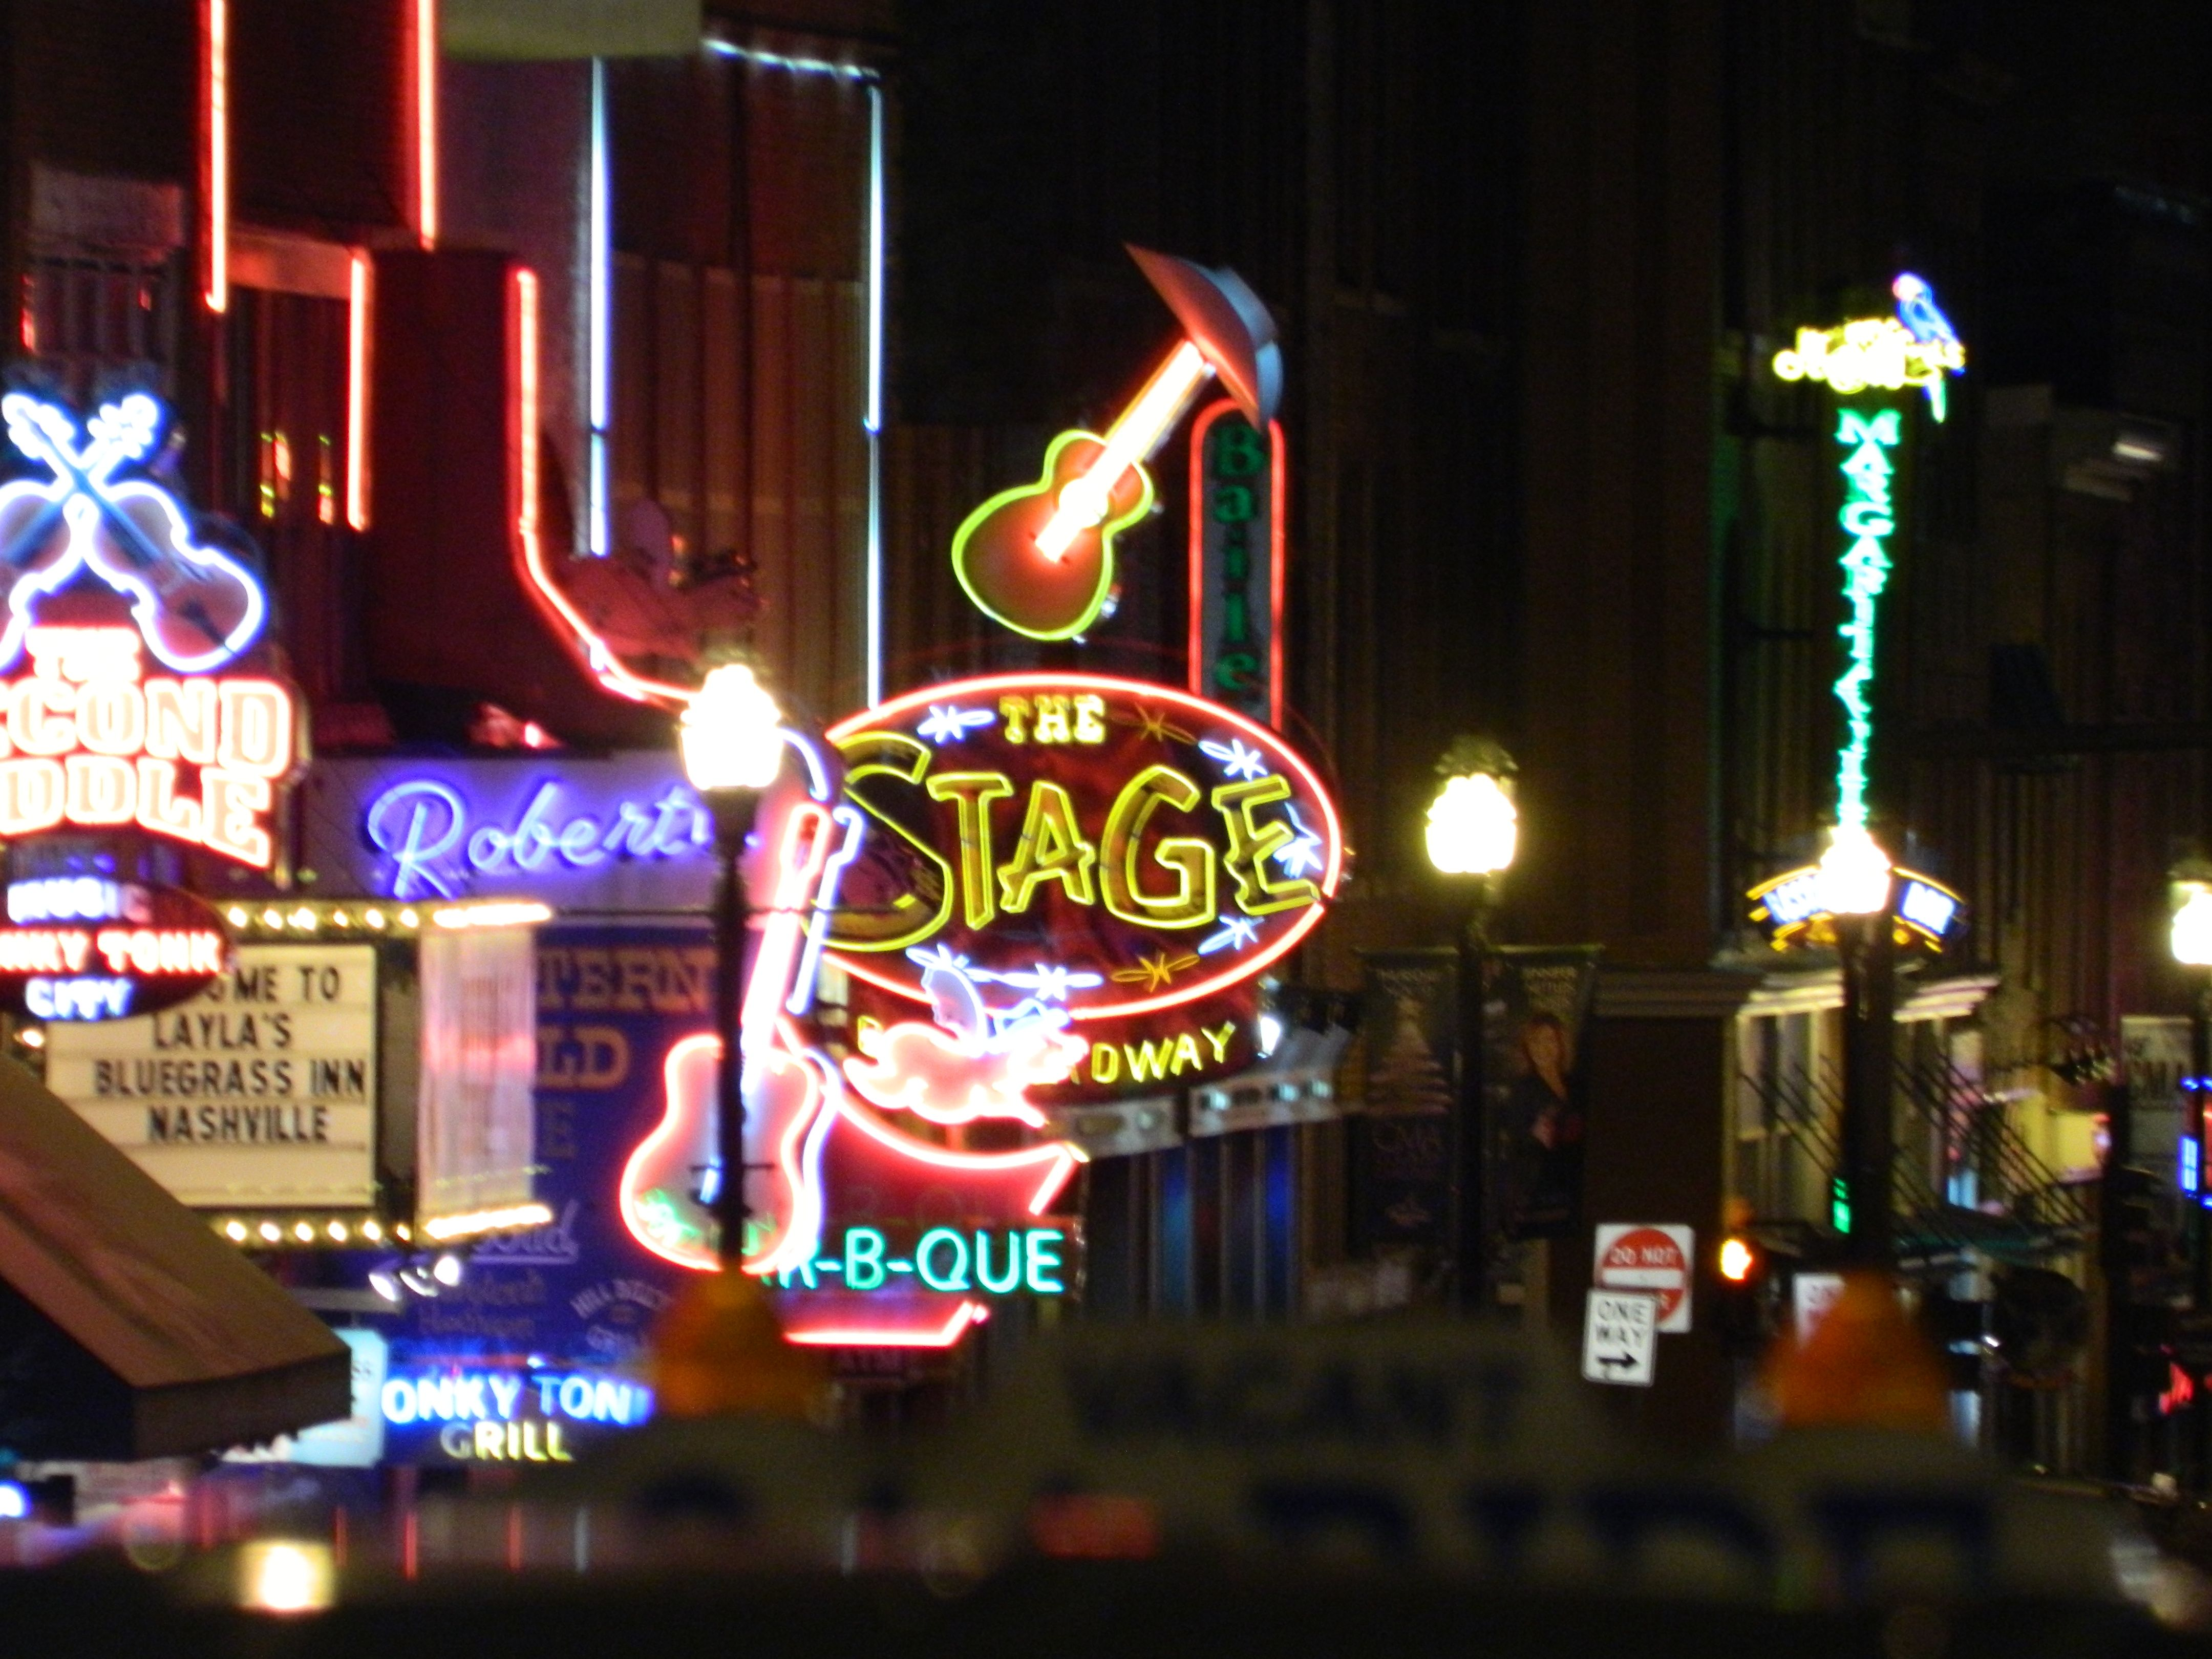 Downtown Nashville, love the hustle & bustle of it